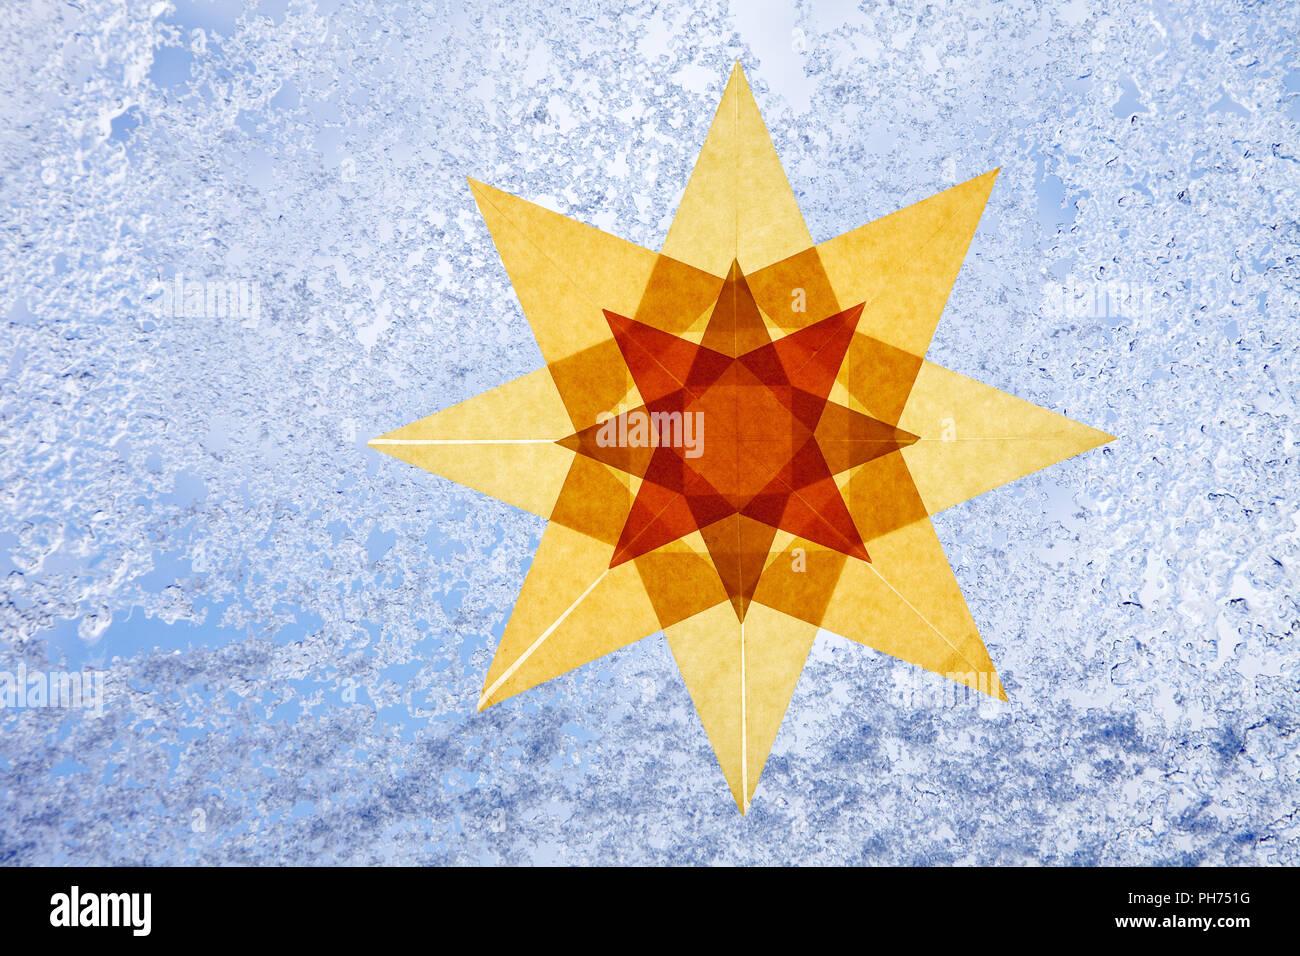 Transparent star, window decoration, wintertime - Stock Image